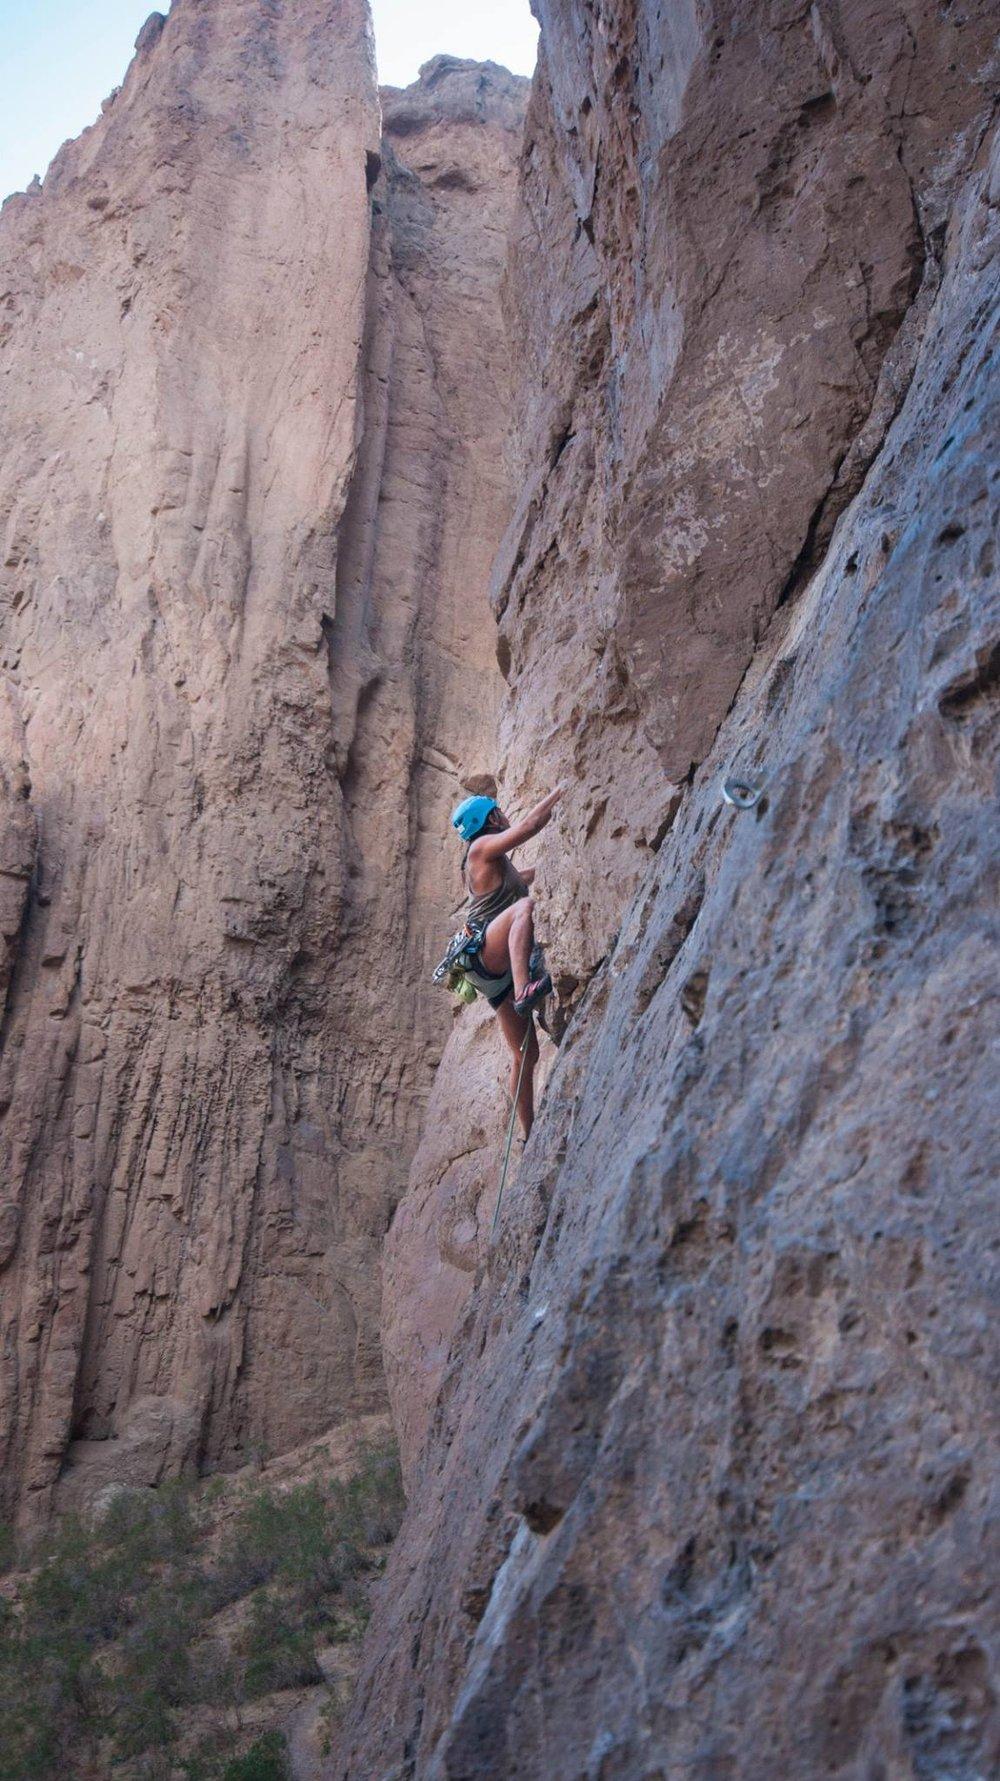 201502-Climbing6B-Piedra Parada-Argentina.jpg